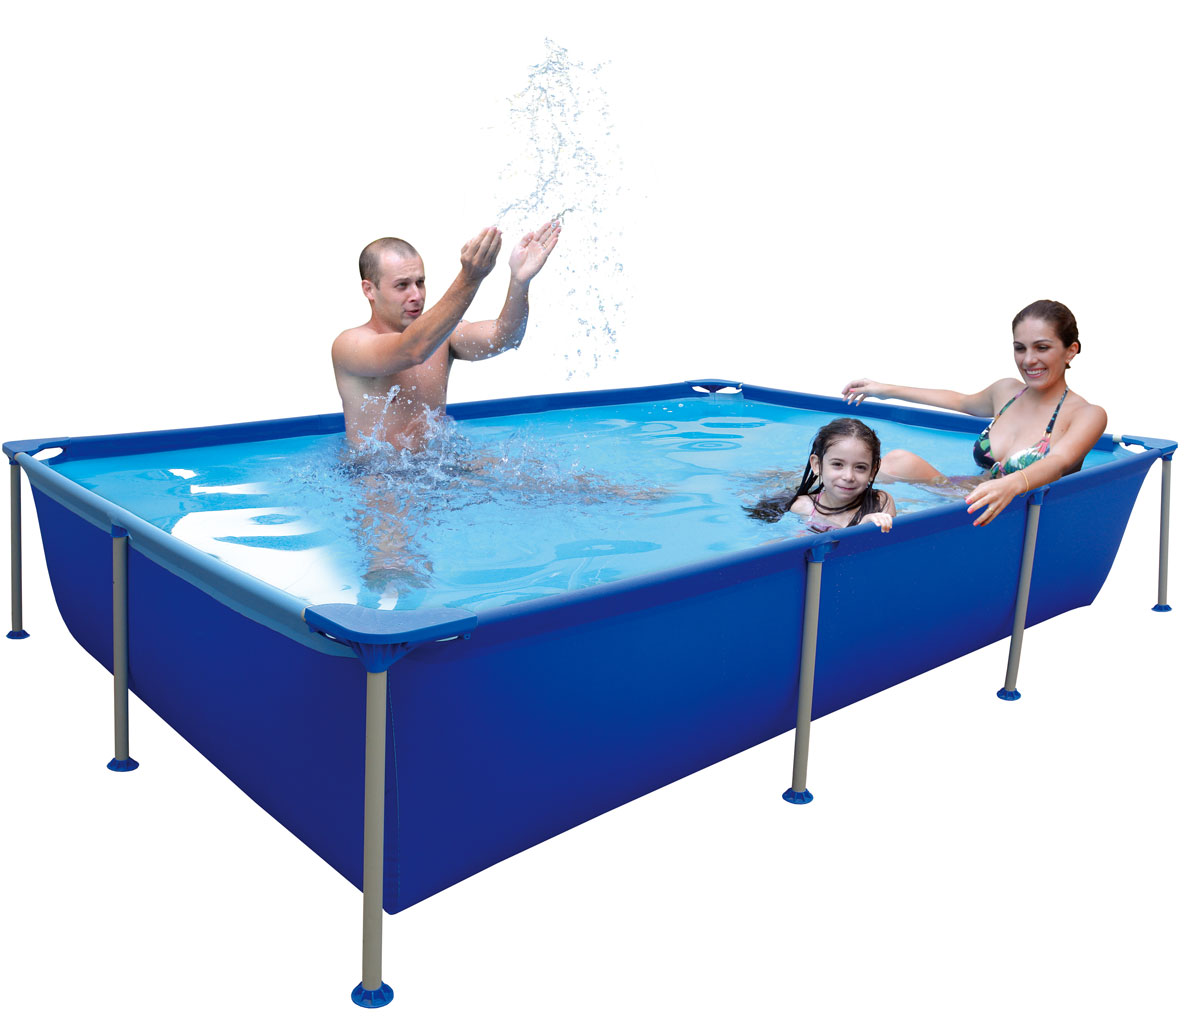 Бассейн каркасный Jilong Rectangular, семейный, цвет: голубой, 258 см х 179 см х 66 см бассейн надувной jilong figure 8 175 х 109 х 46 см